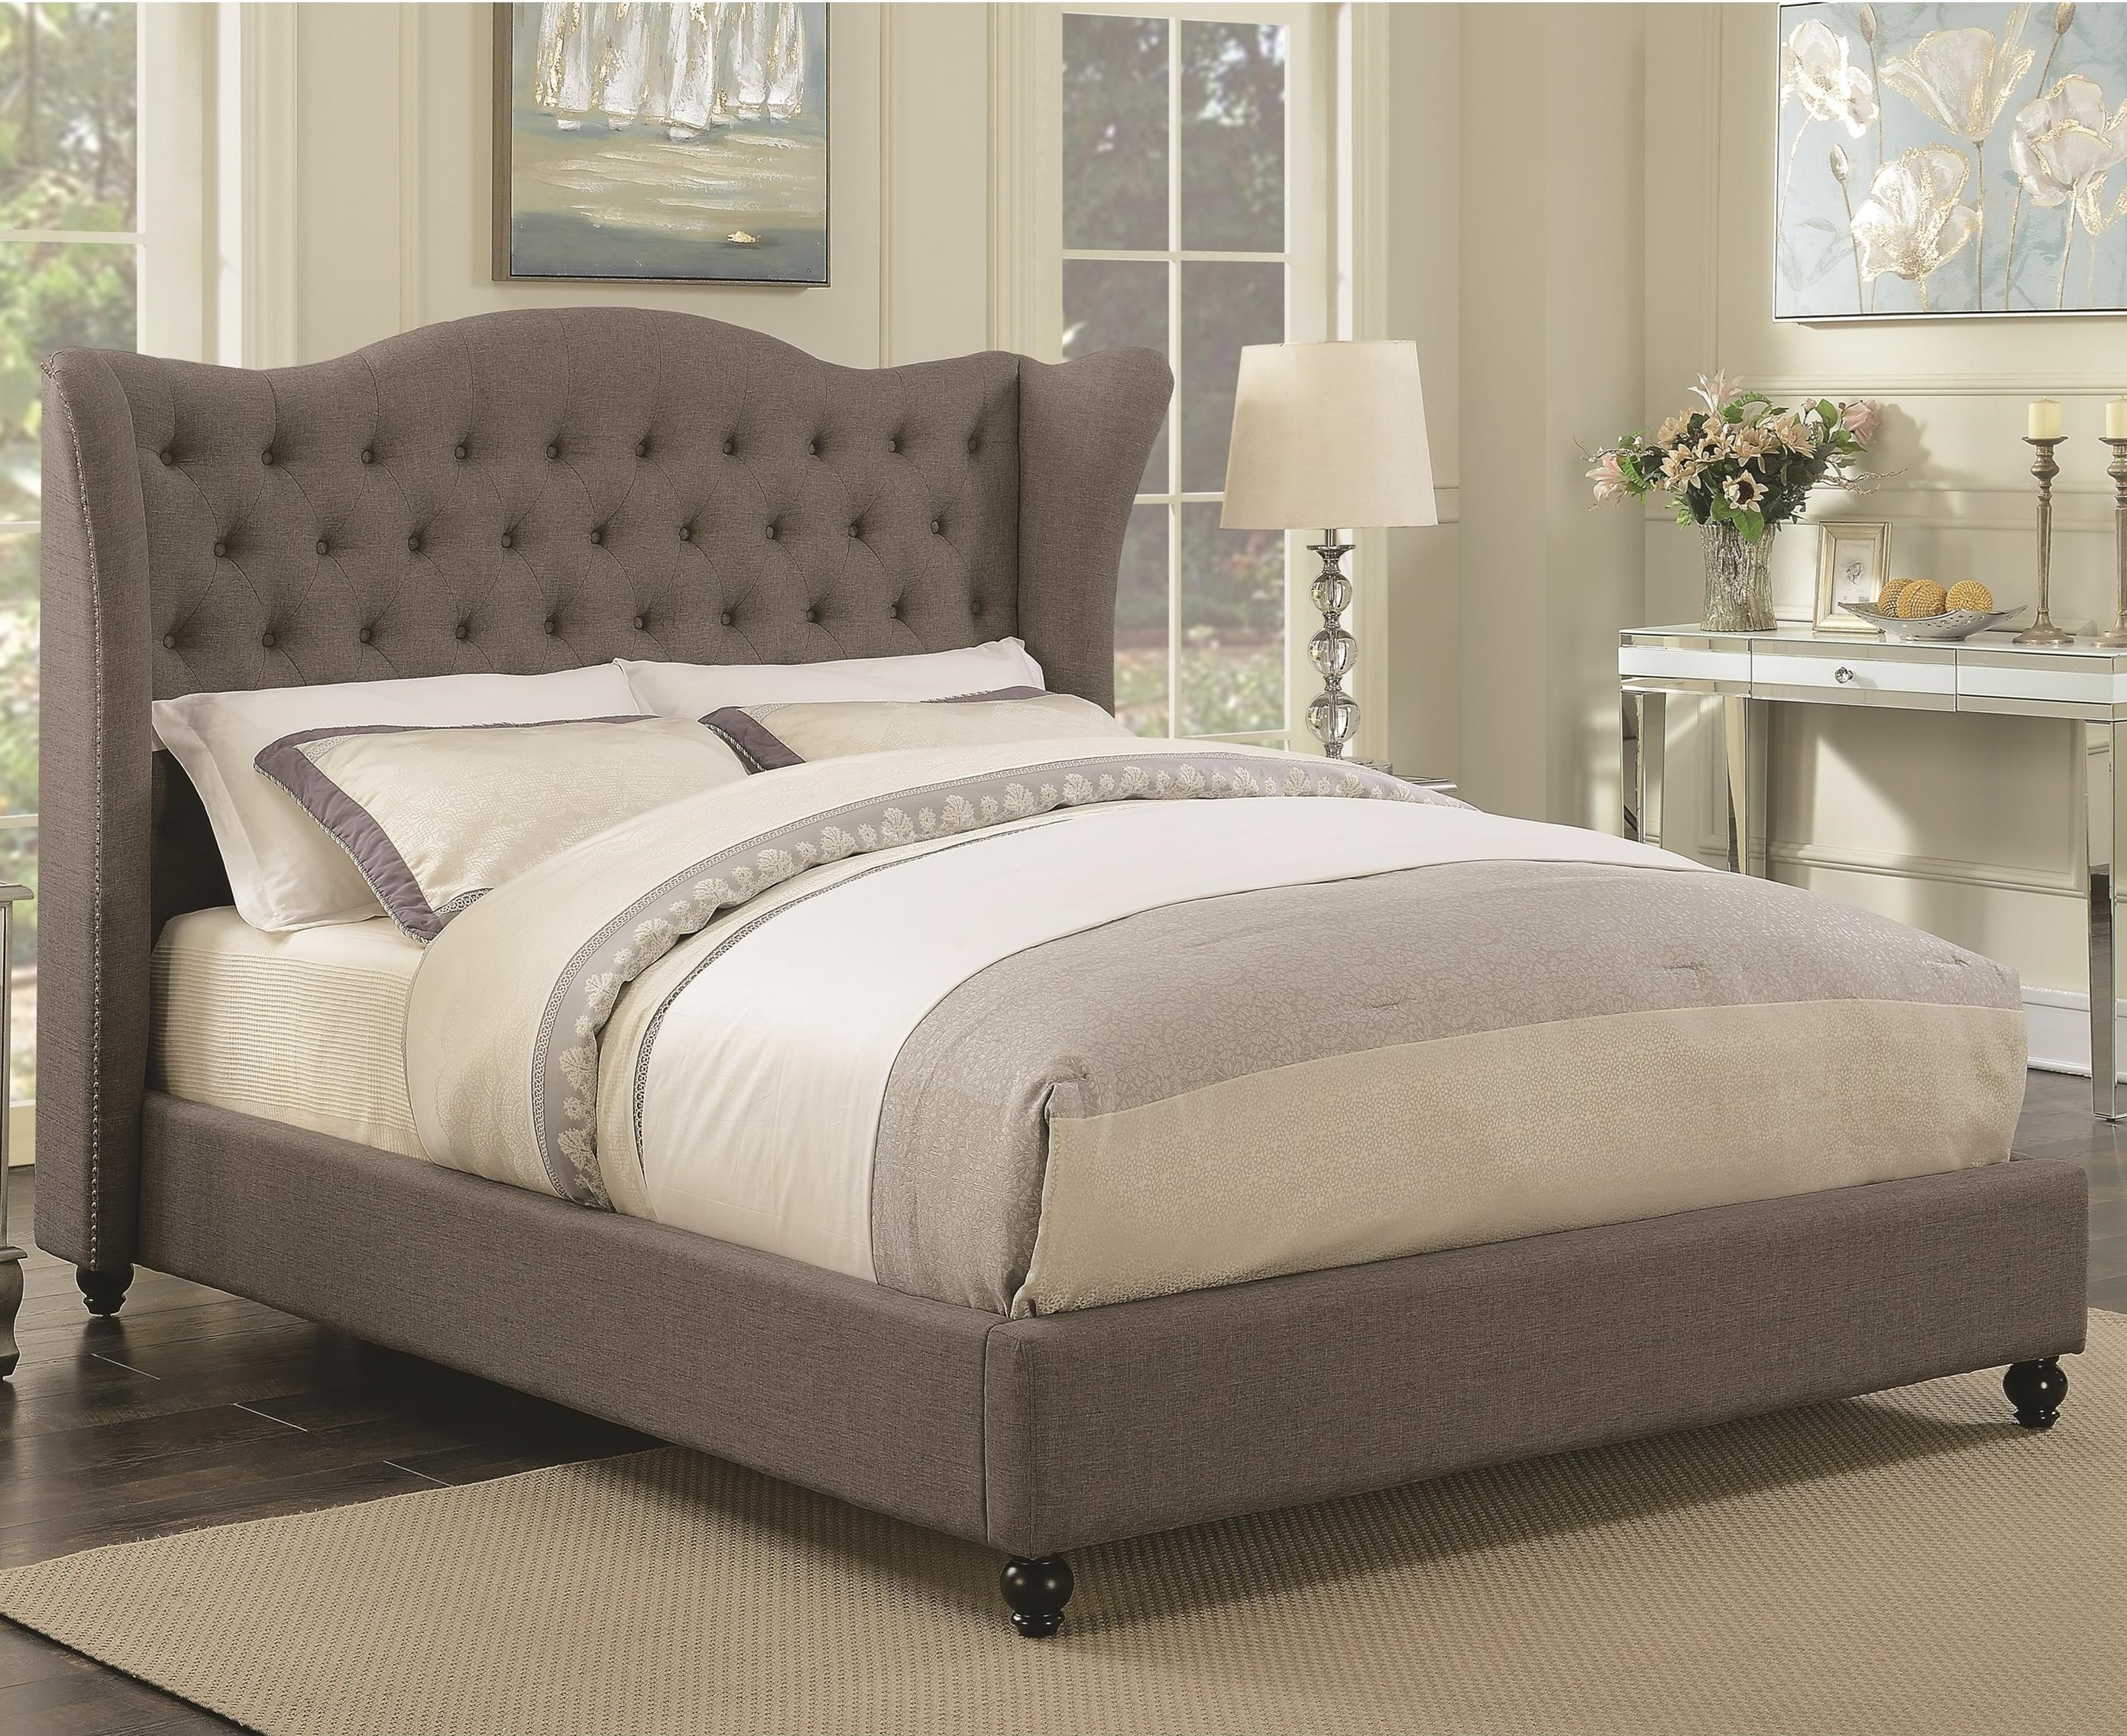 Coaster Newburgh California King Upholstered Bed - Item Number: 300739KW